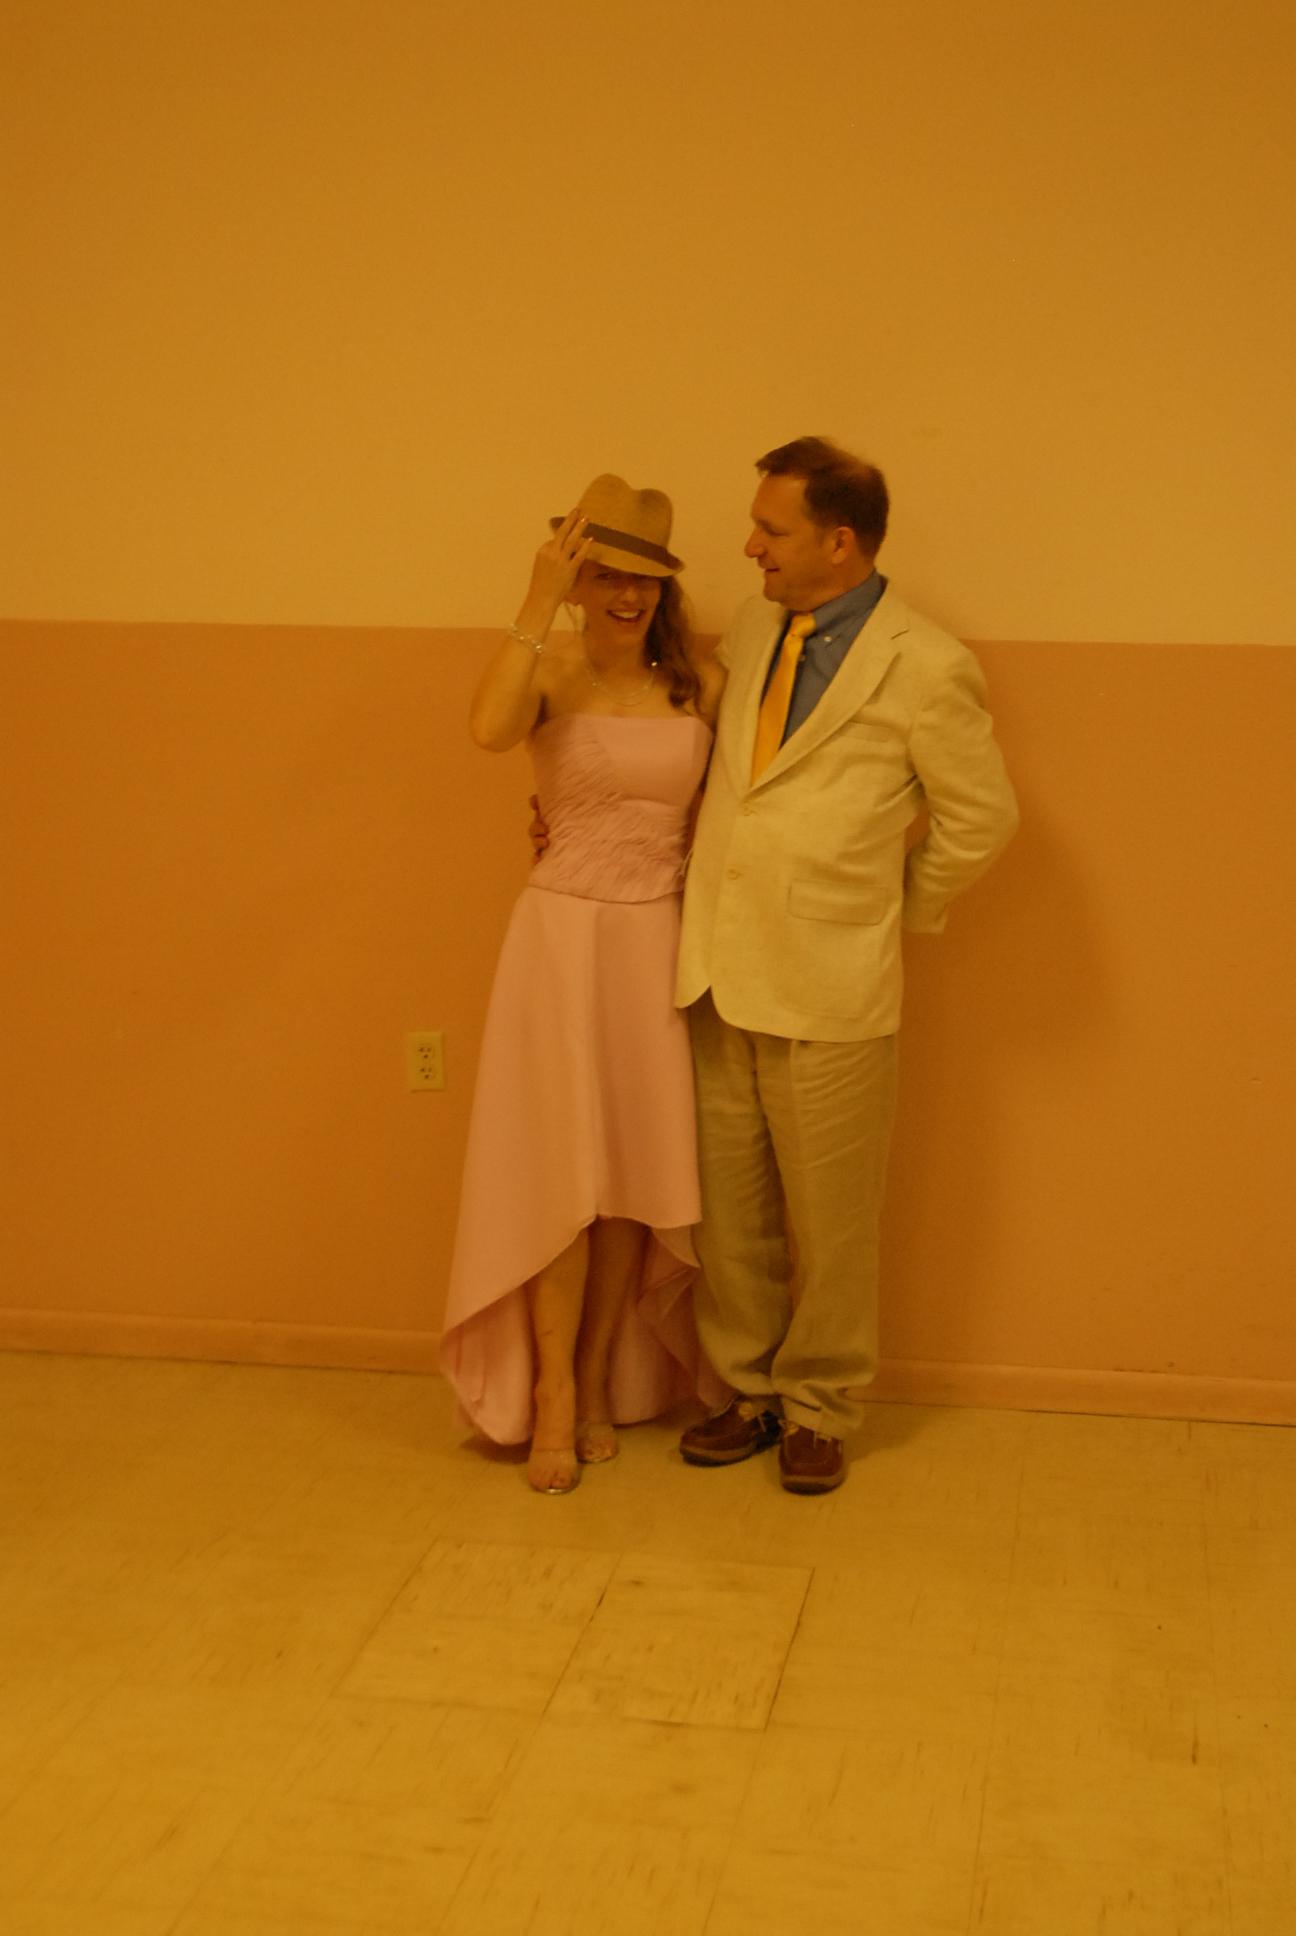 emily-and-travis-4-1-2013-april-fools-wedding-2-463